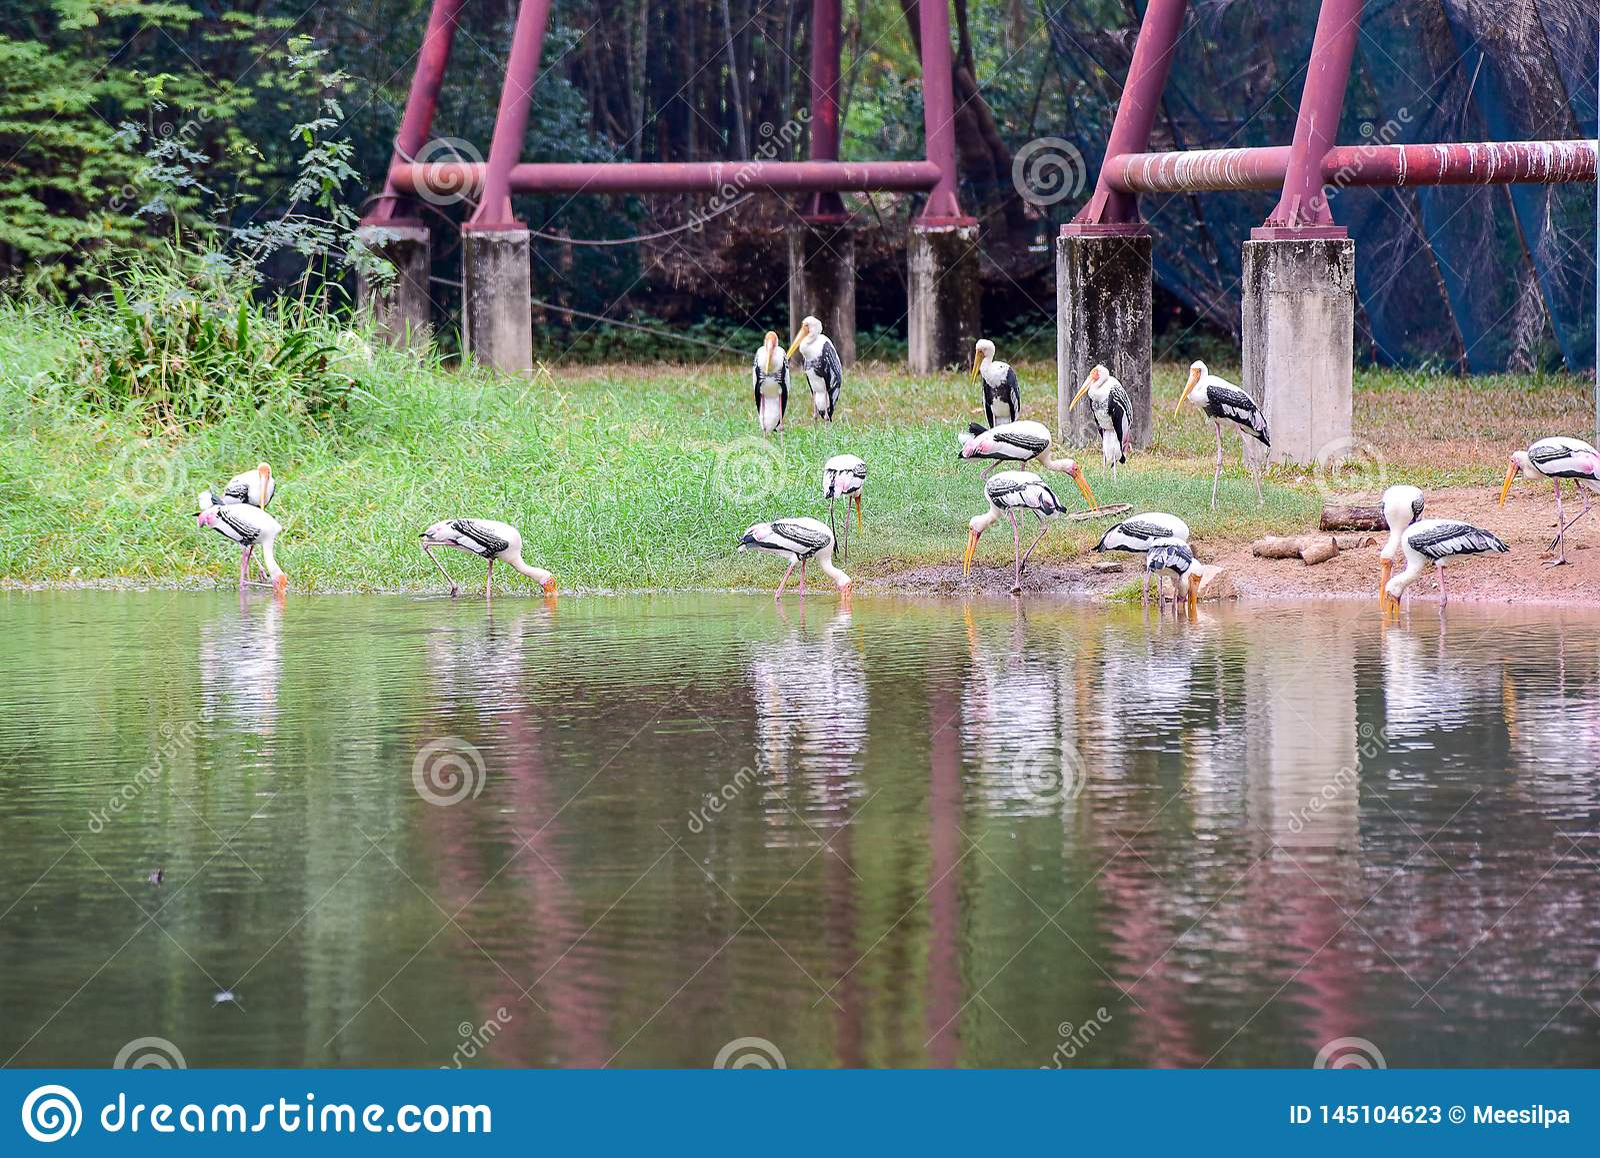 Chai Nat泰国12月26日2019看见在Chai Nat飞禽公园的鸟是chainat省地方  鸟笼是最大的